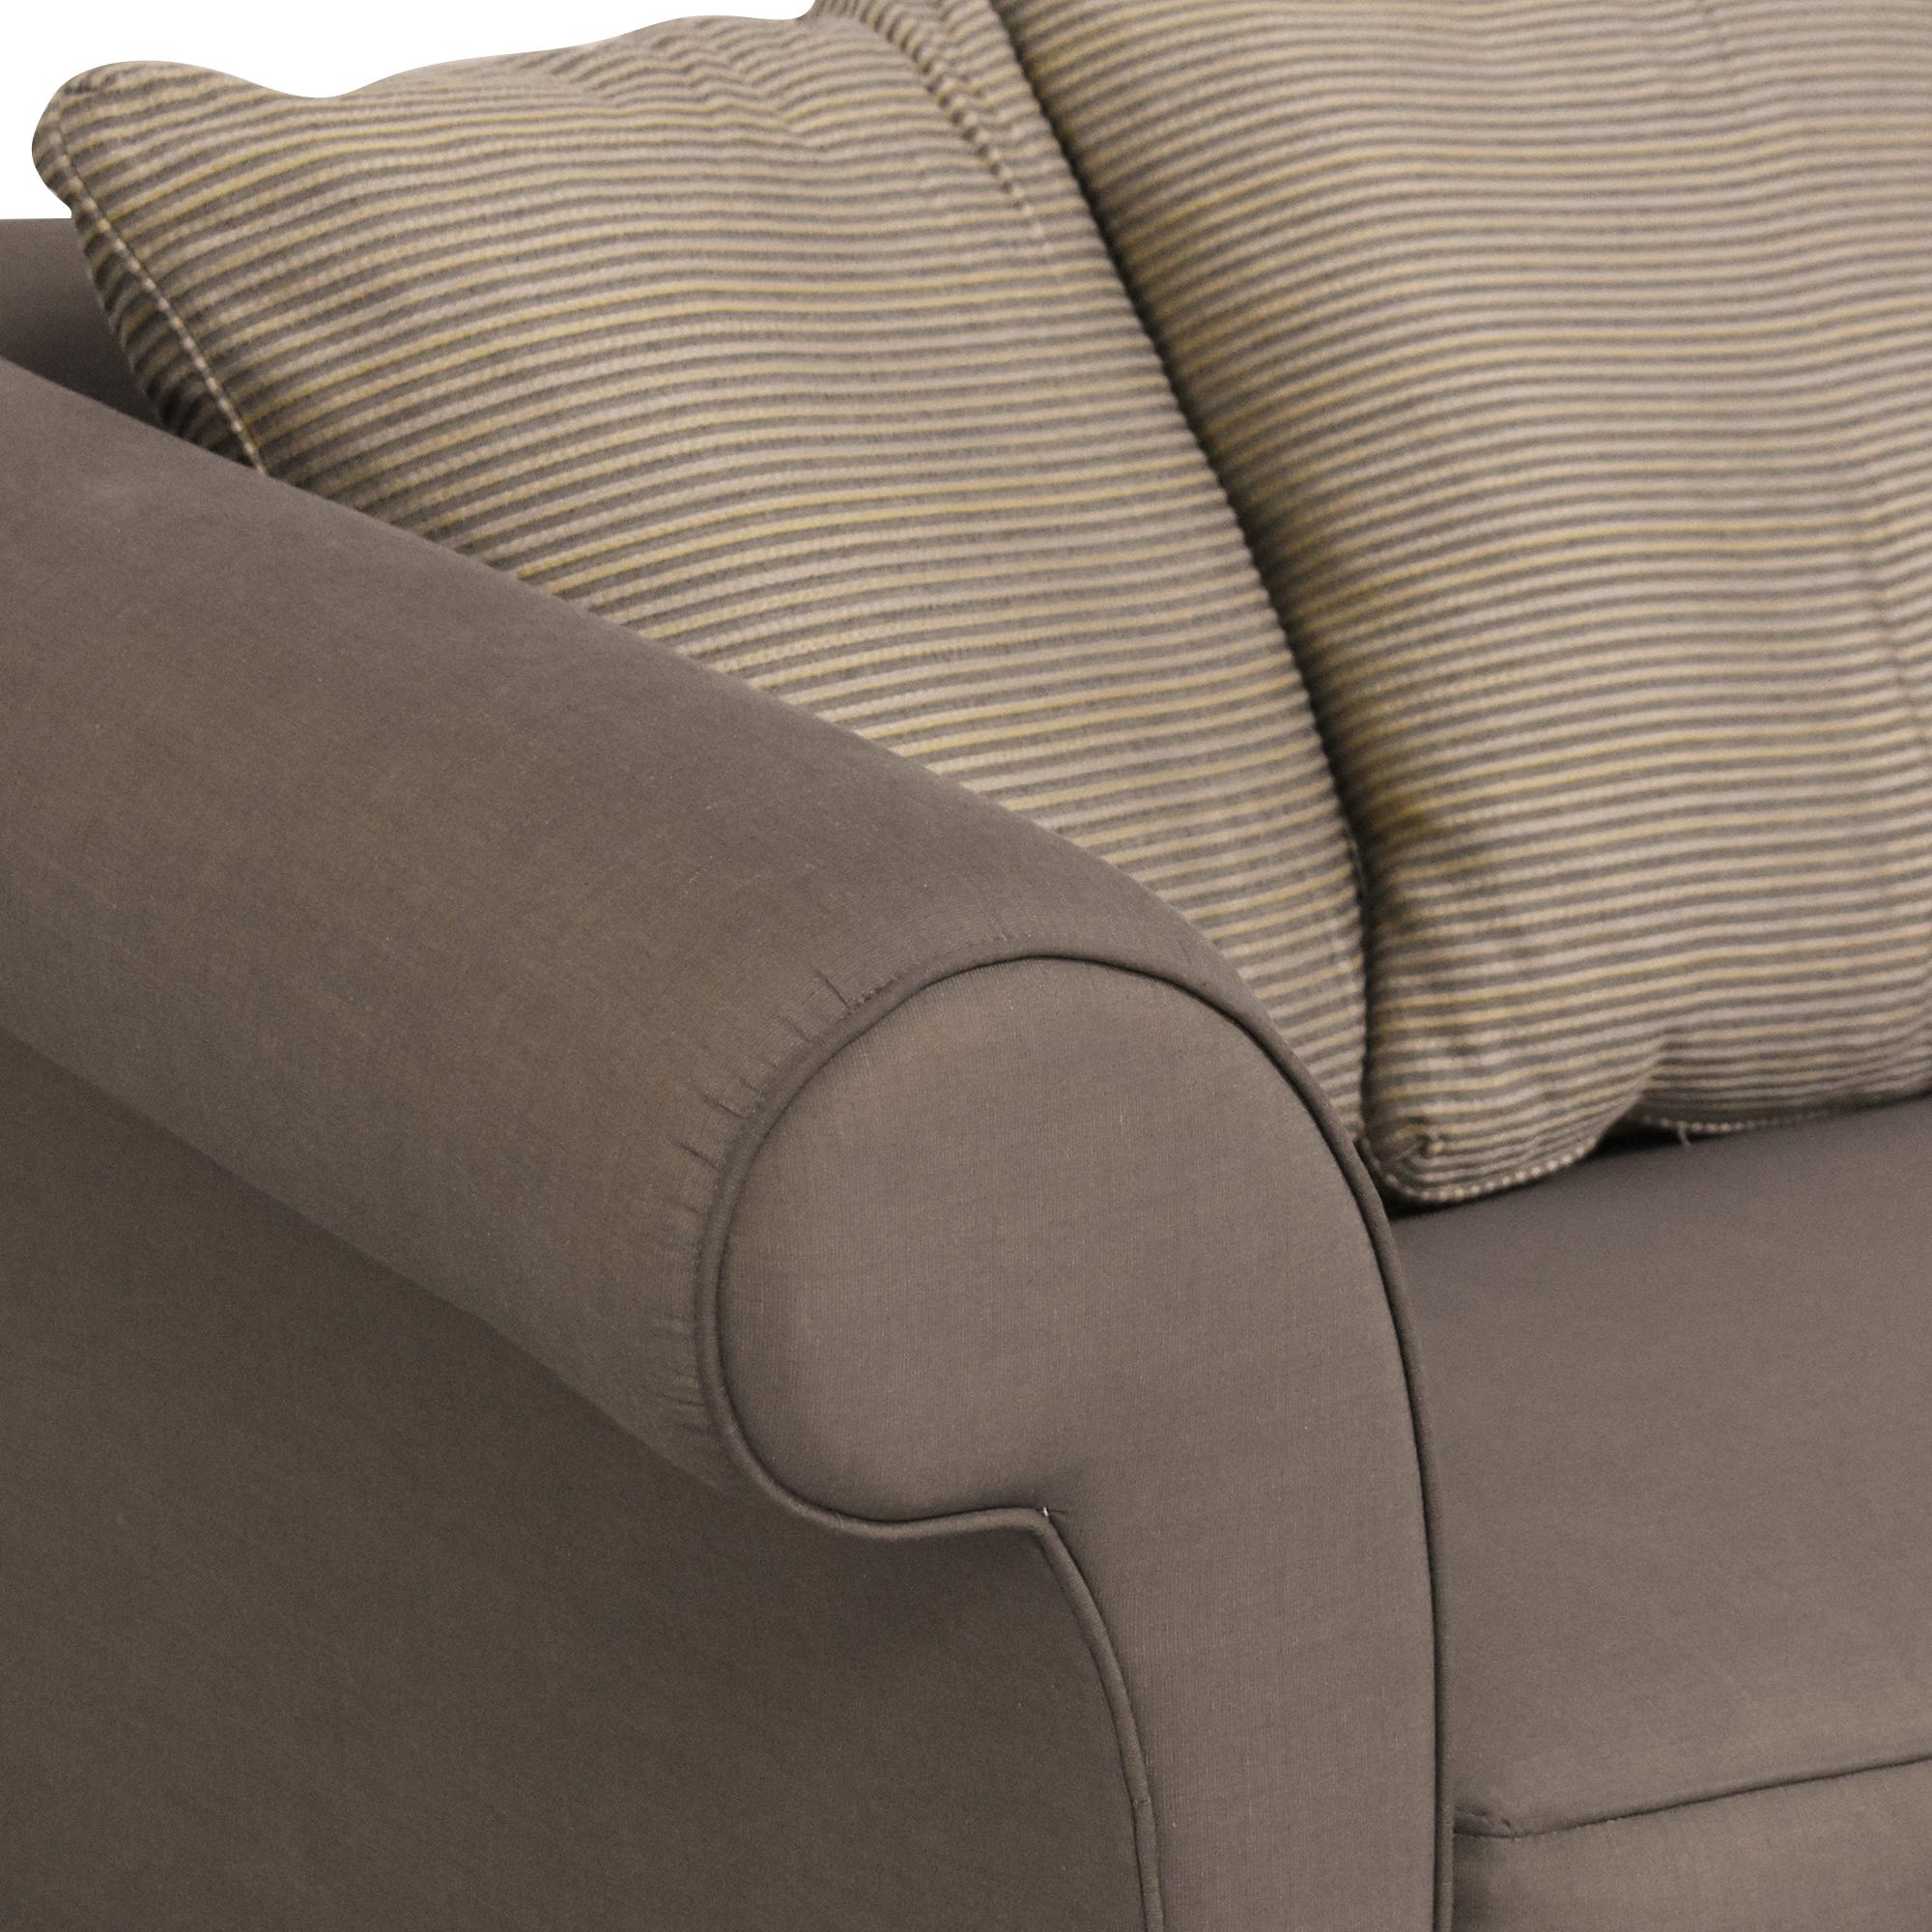 buy Ethan Allen Ethan Allen Shelter Sofa online